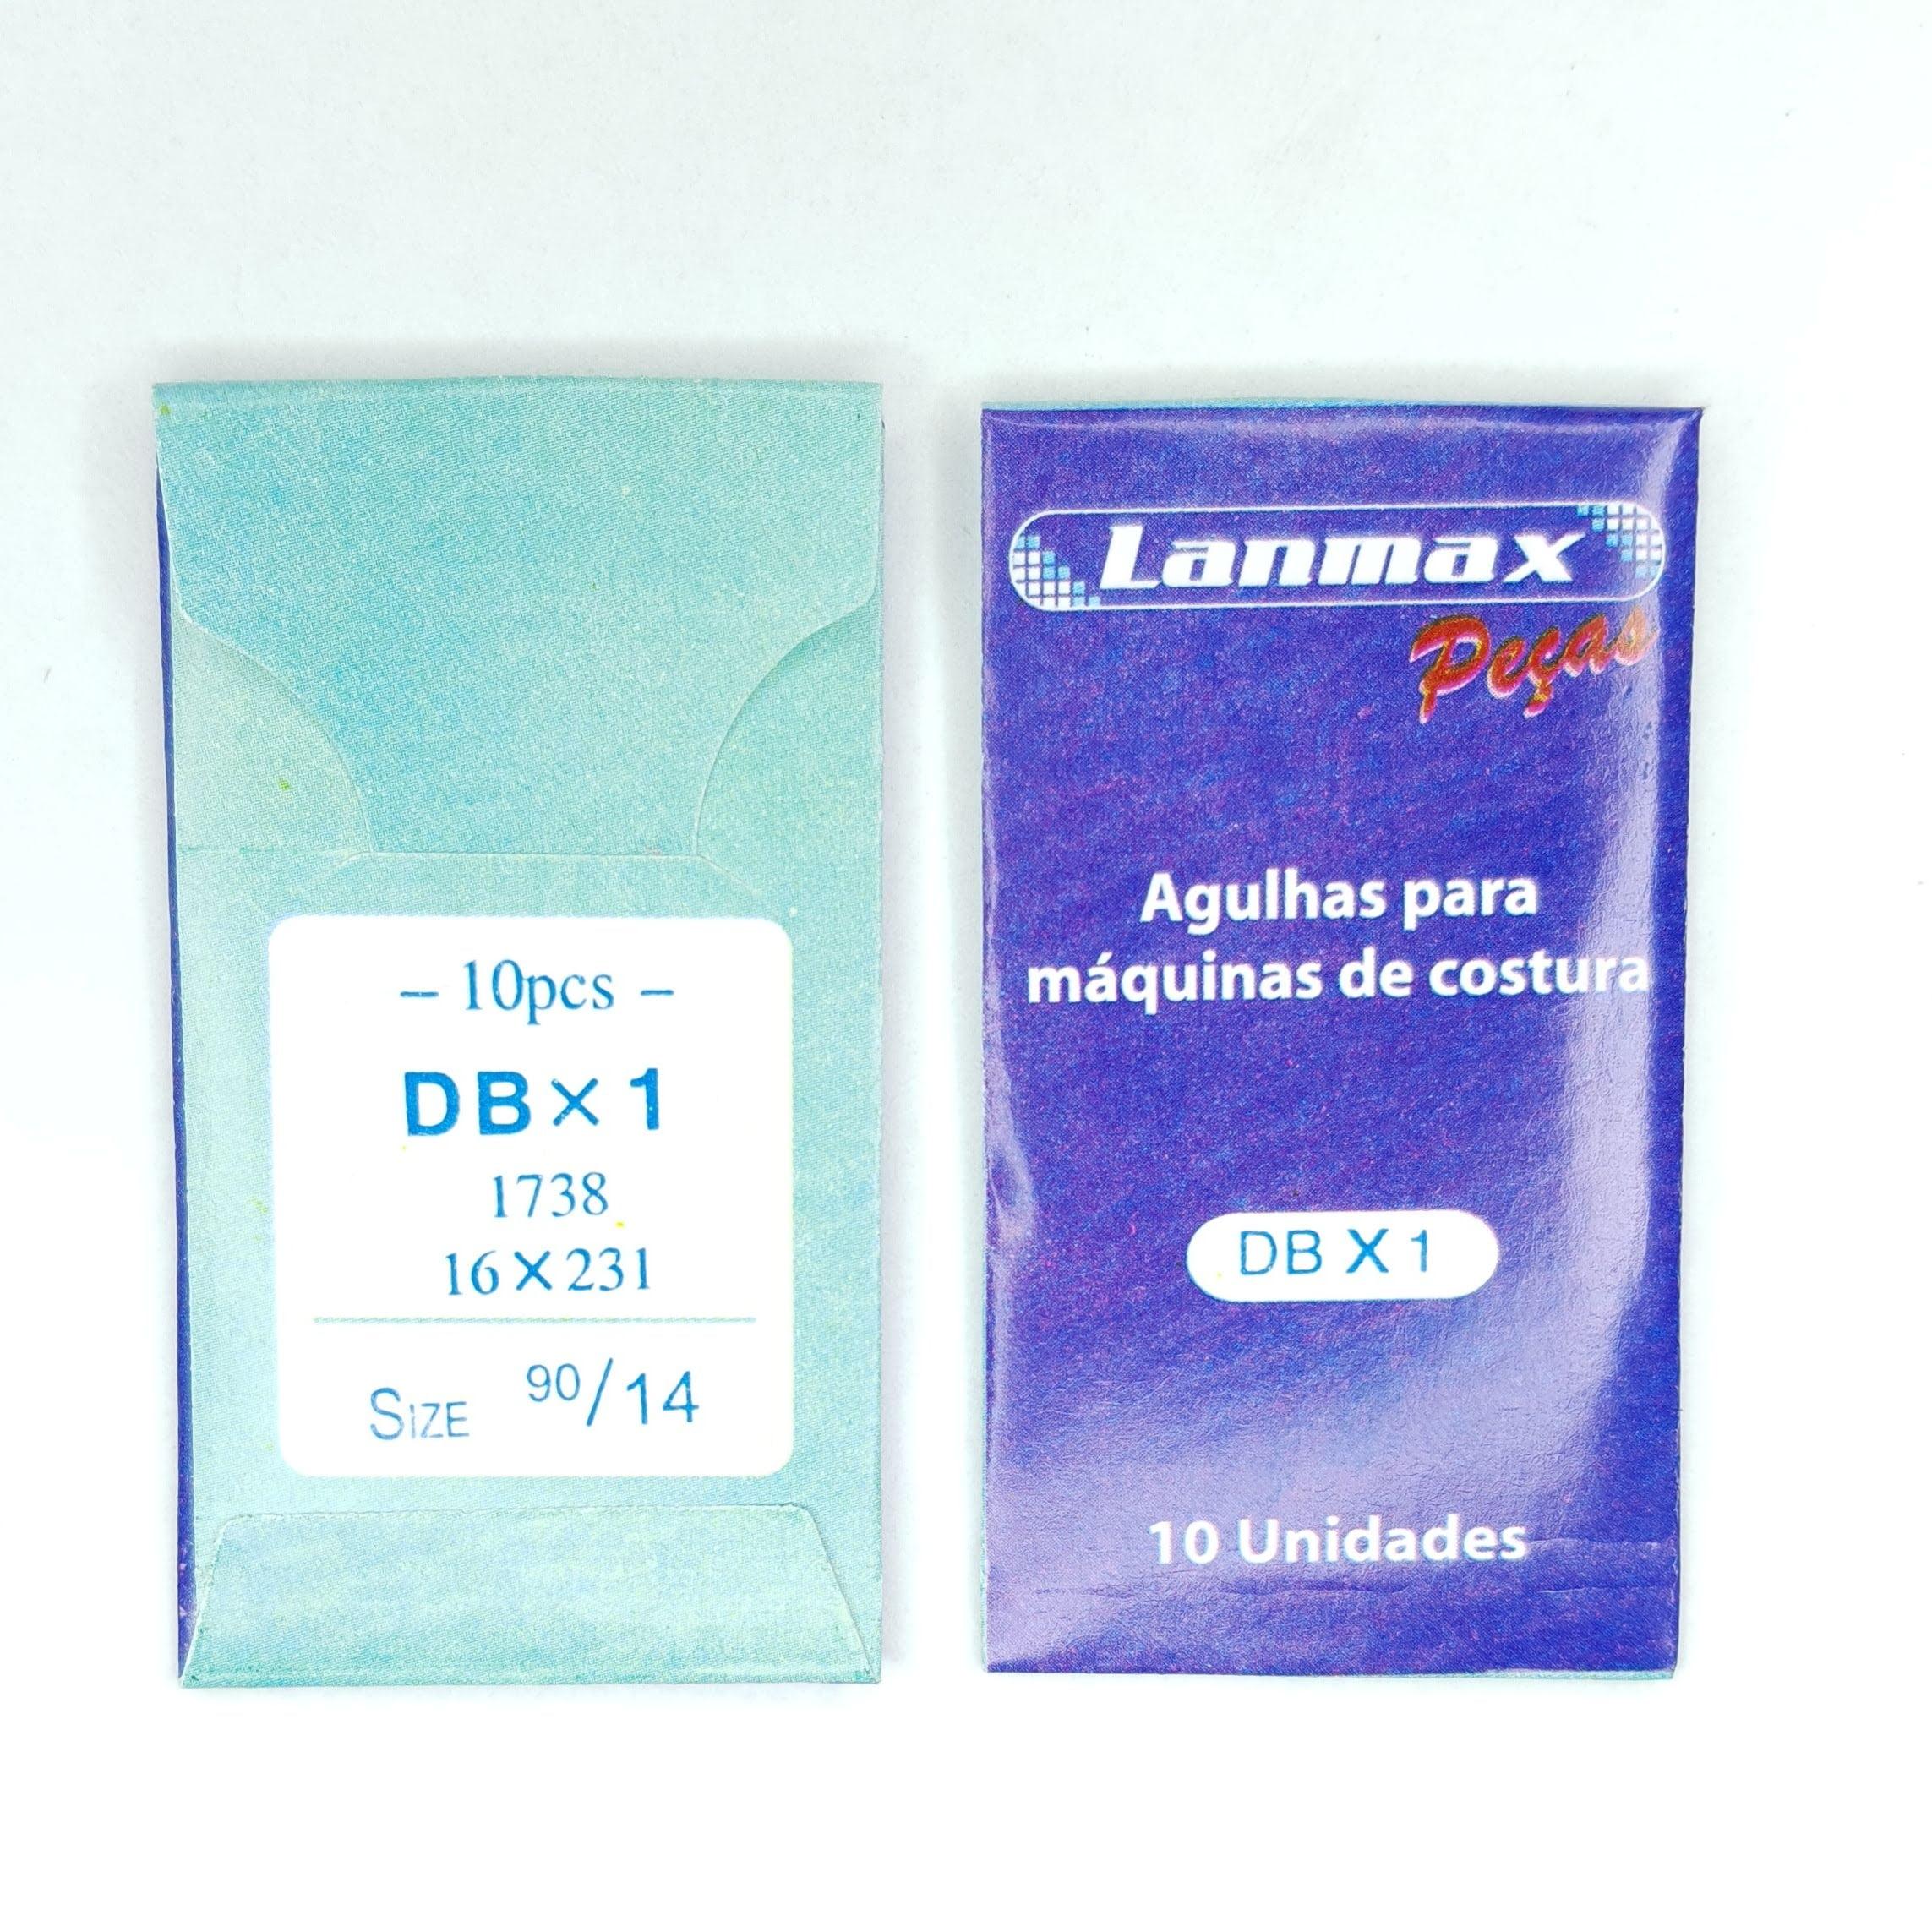 AGULHA PARA MAQUINA DE COSTURA RETA INDUSTRIAL DBX1 - 90/14 - CABO FINO